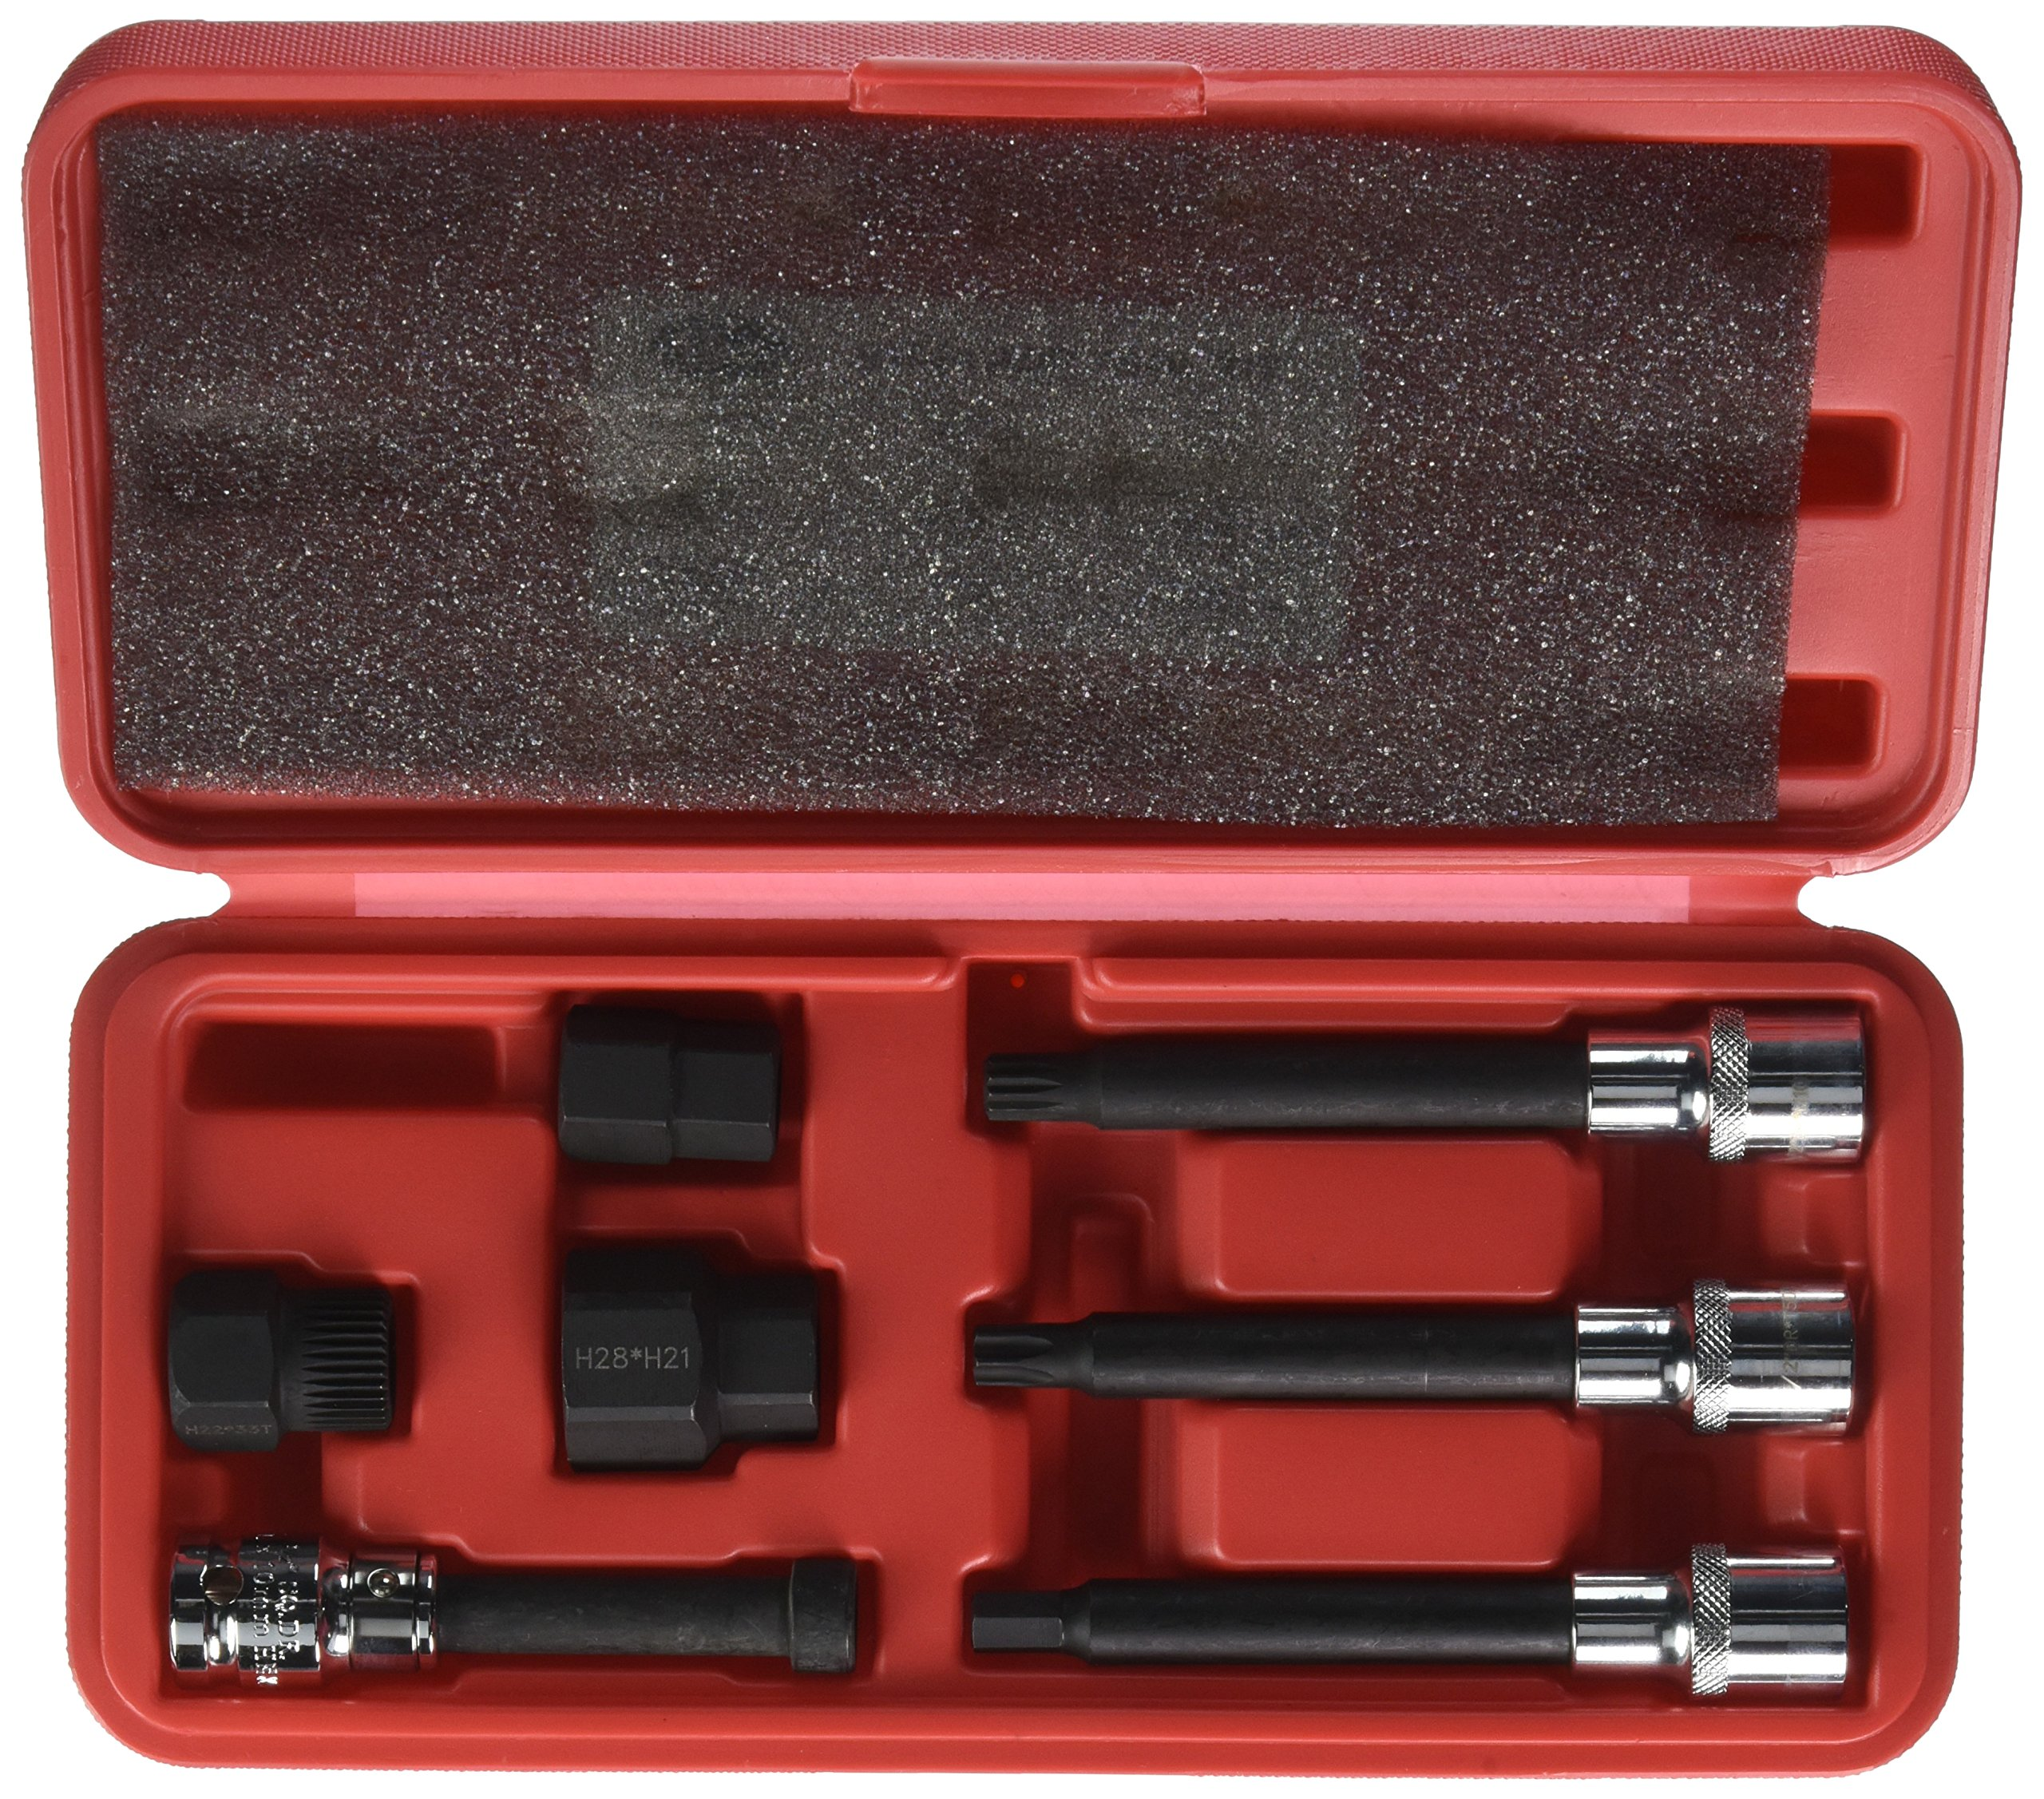 Gates 91024 Alternator Decoupler Pulley Tool Kit with Case